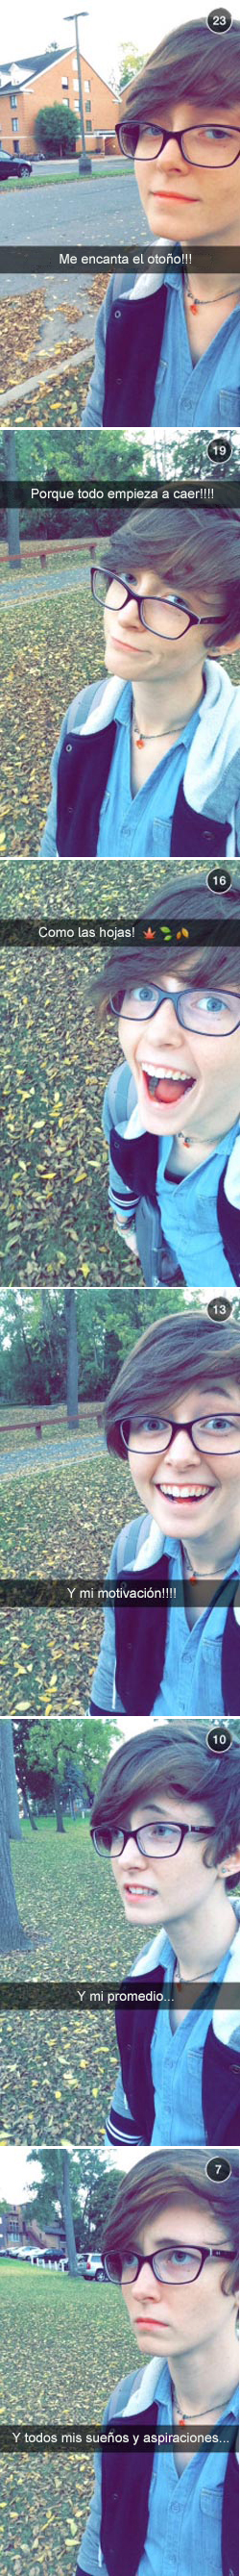 Historia snapchat, en otoño todo cae